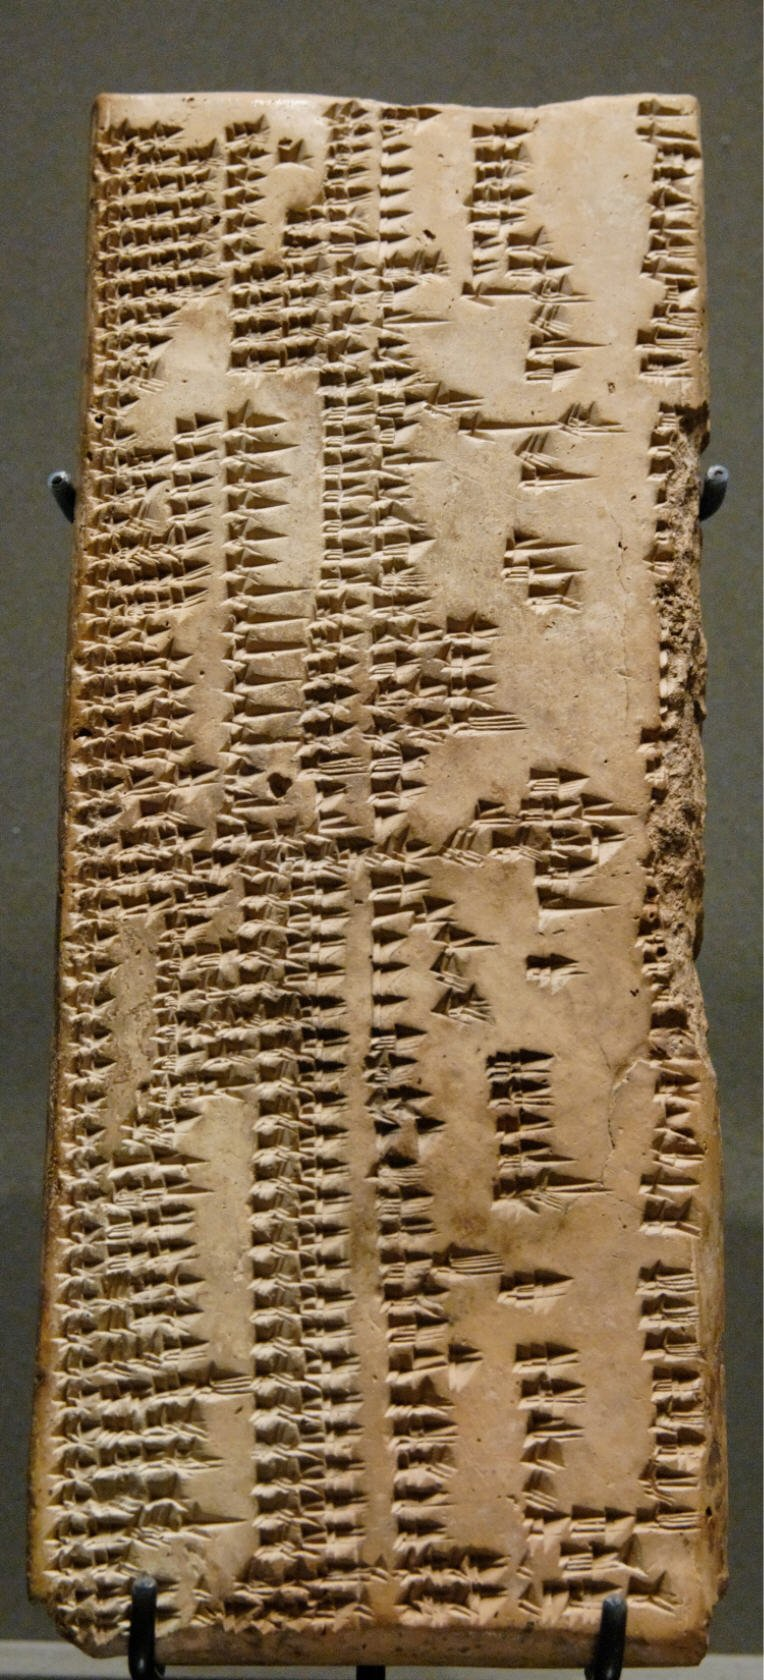 Sumerian-Akkadian lexicon